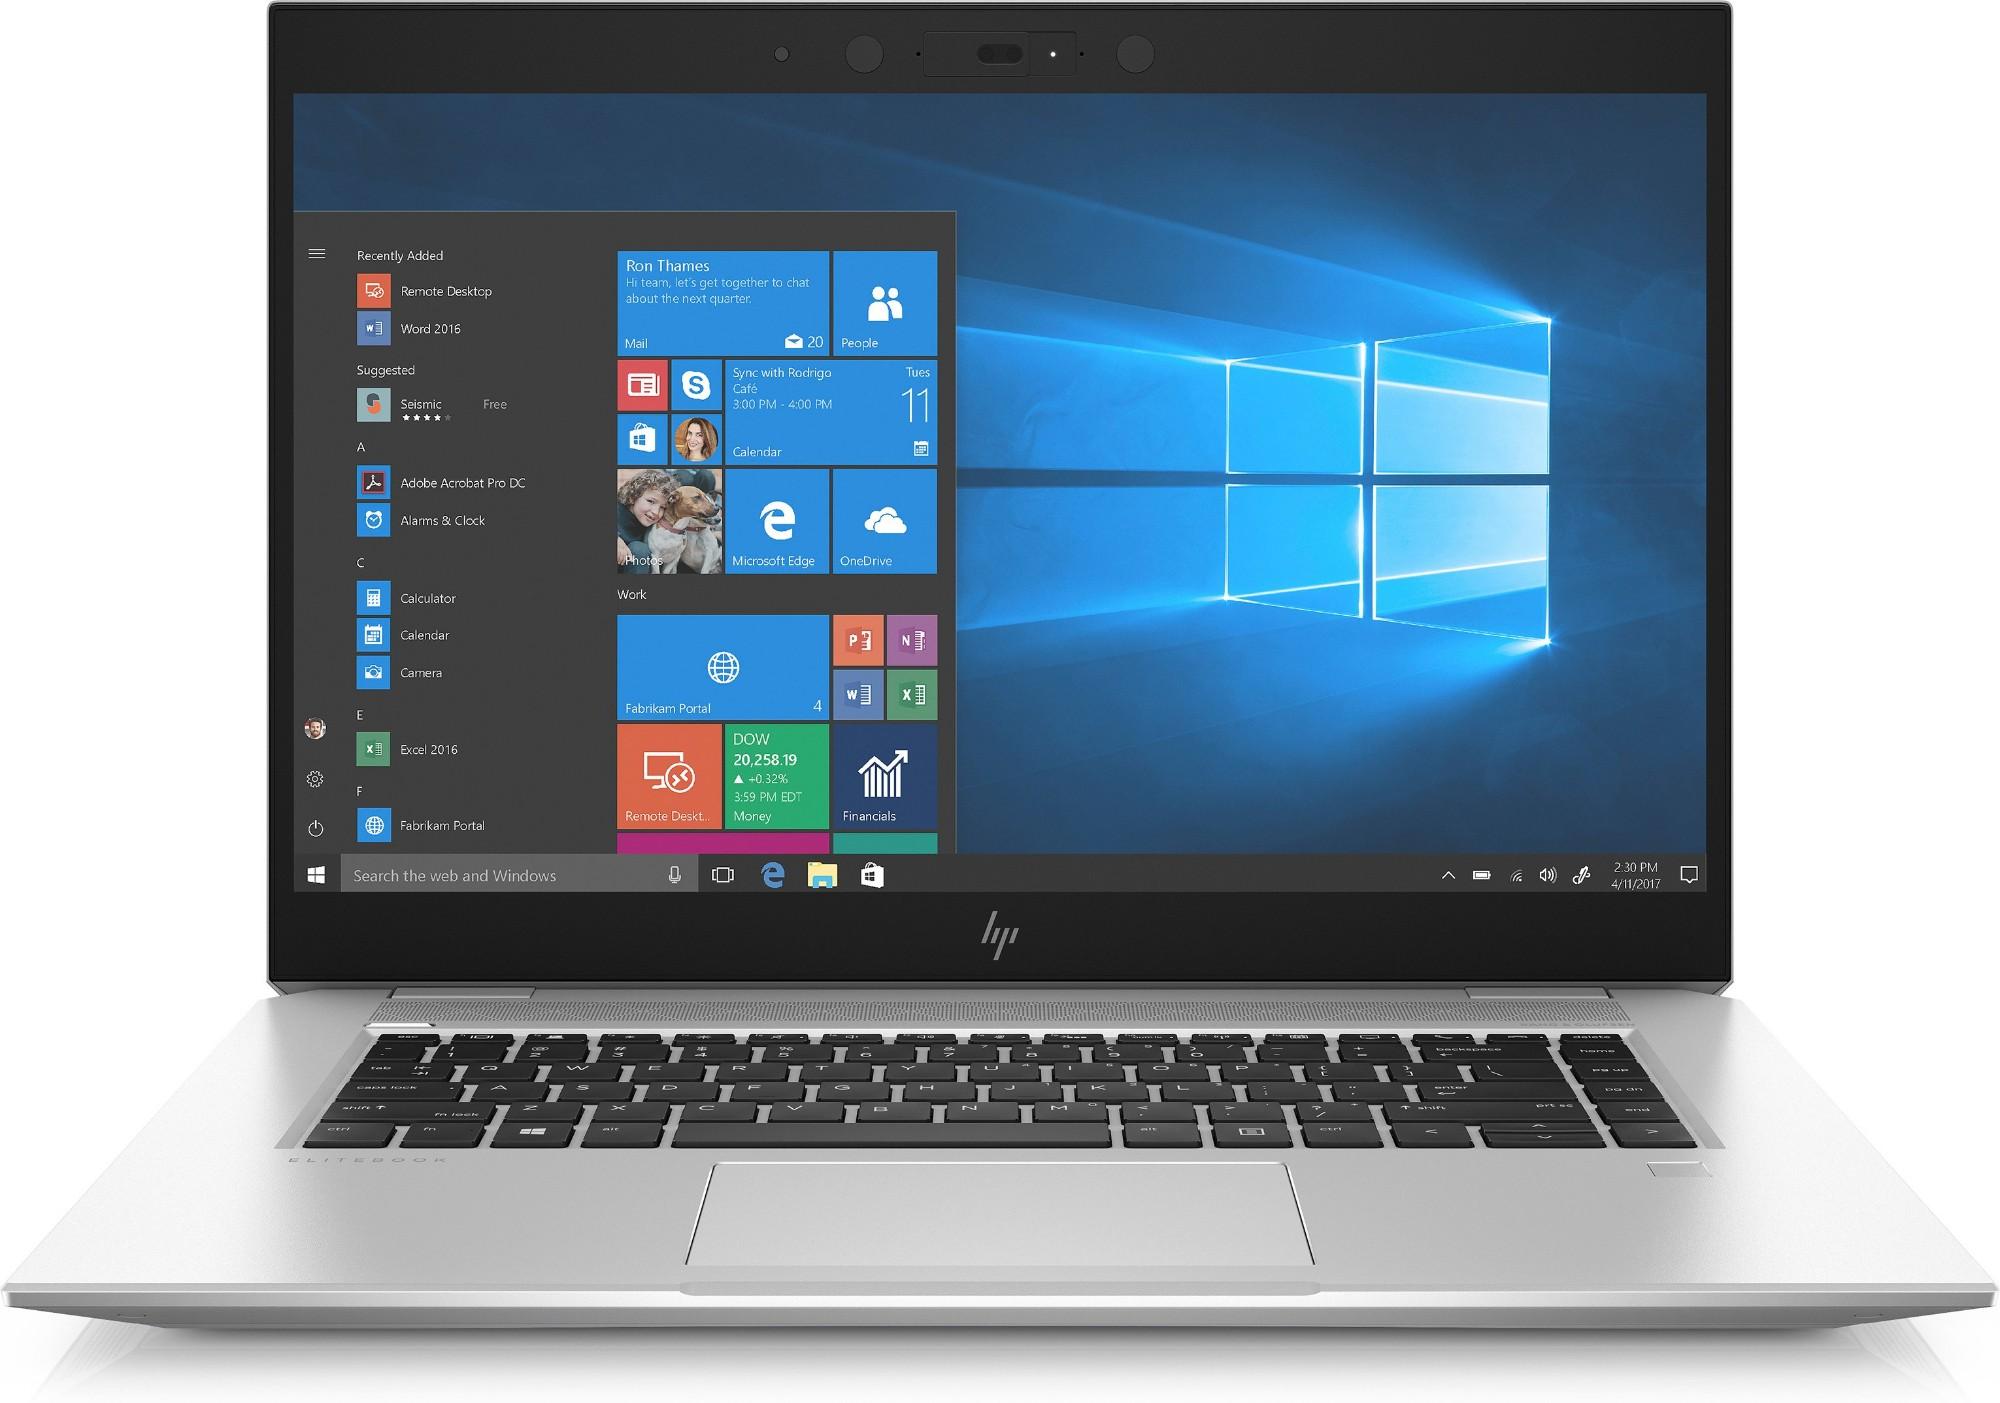 "HP EliteBook 1050 G1 Zilver Notebook 39,6 cm (15.6"") 1920 x 1080 Pixels Intel® 8ste generatie Core™ i5 i5-8300H 16 GB DDR4-SDRAM 512 GB SSD"